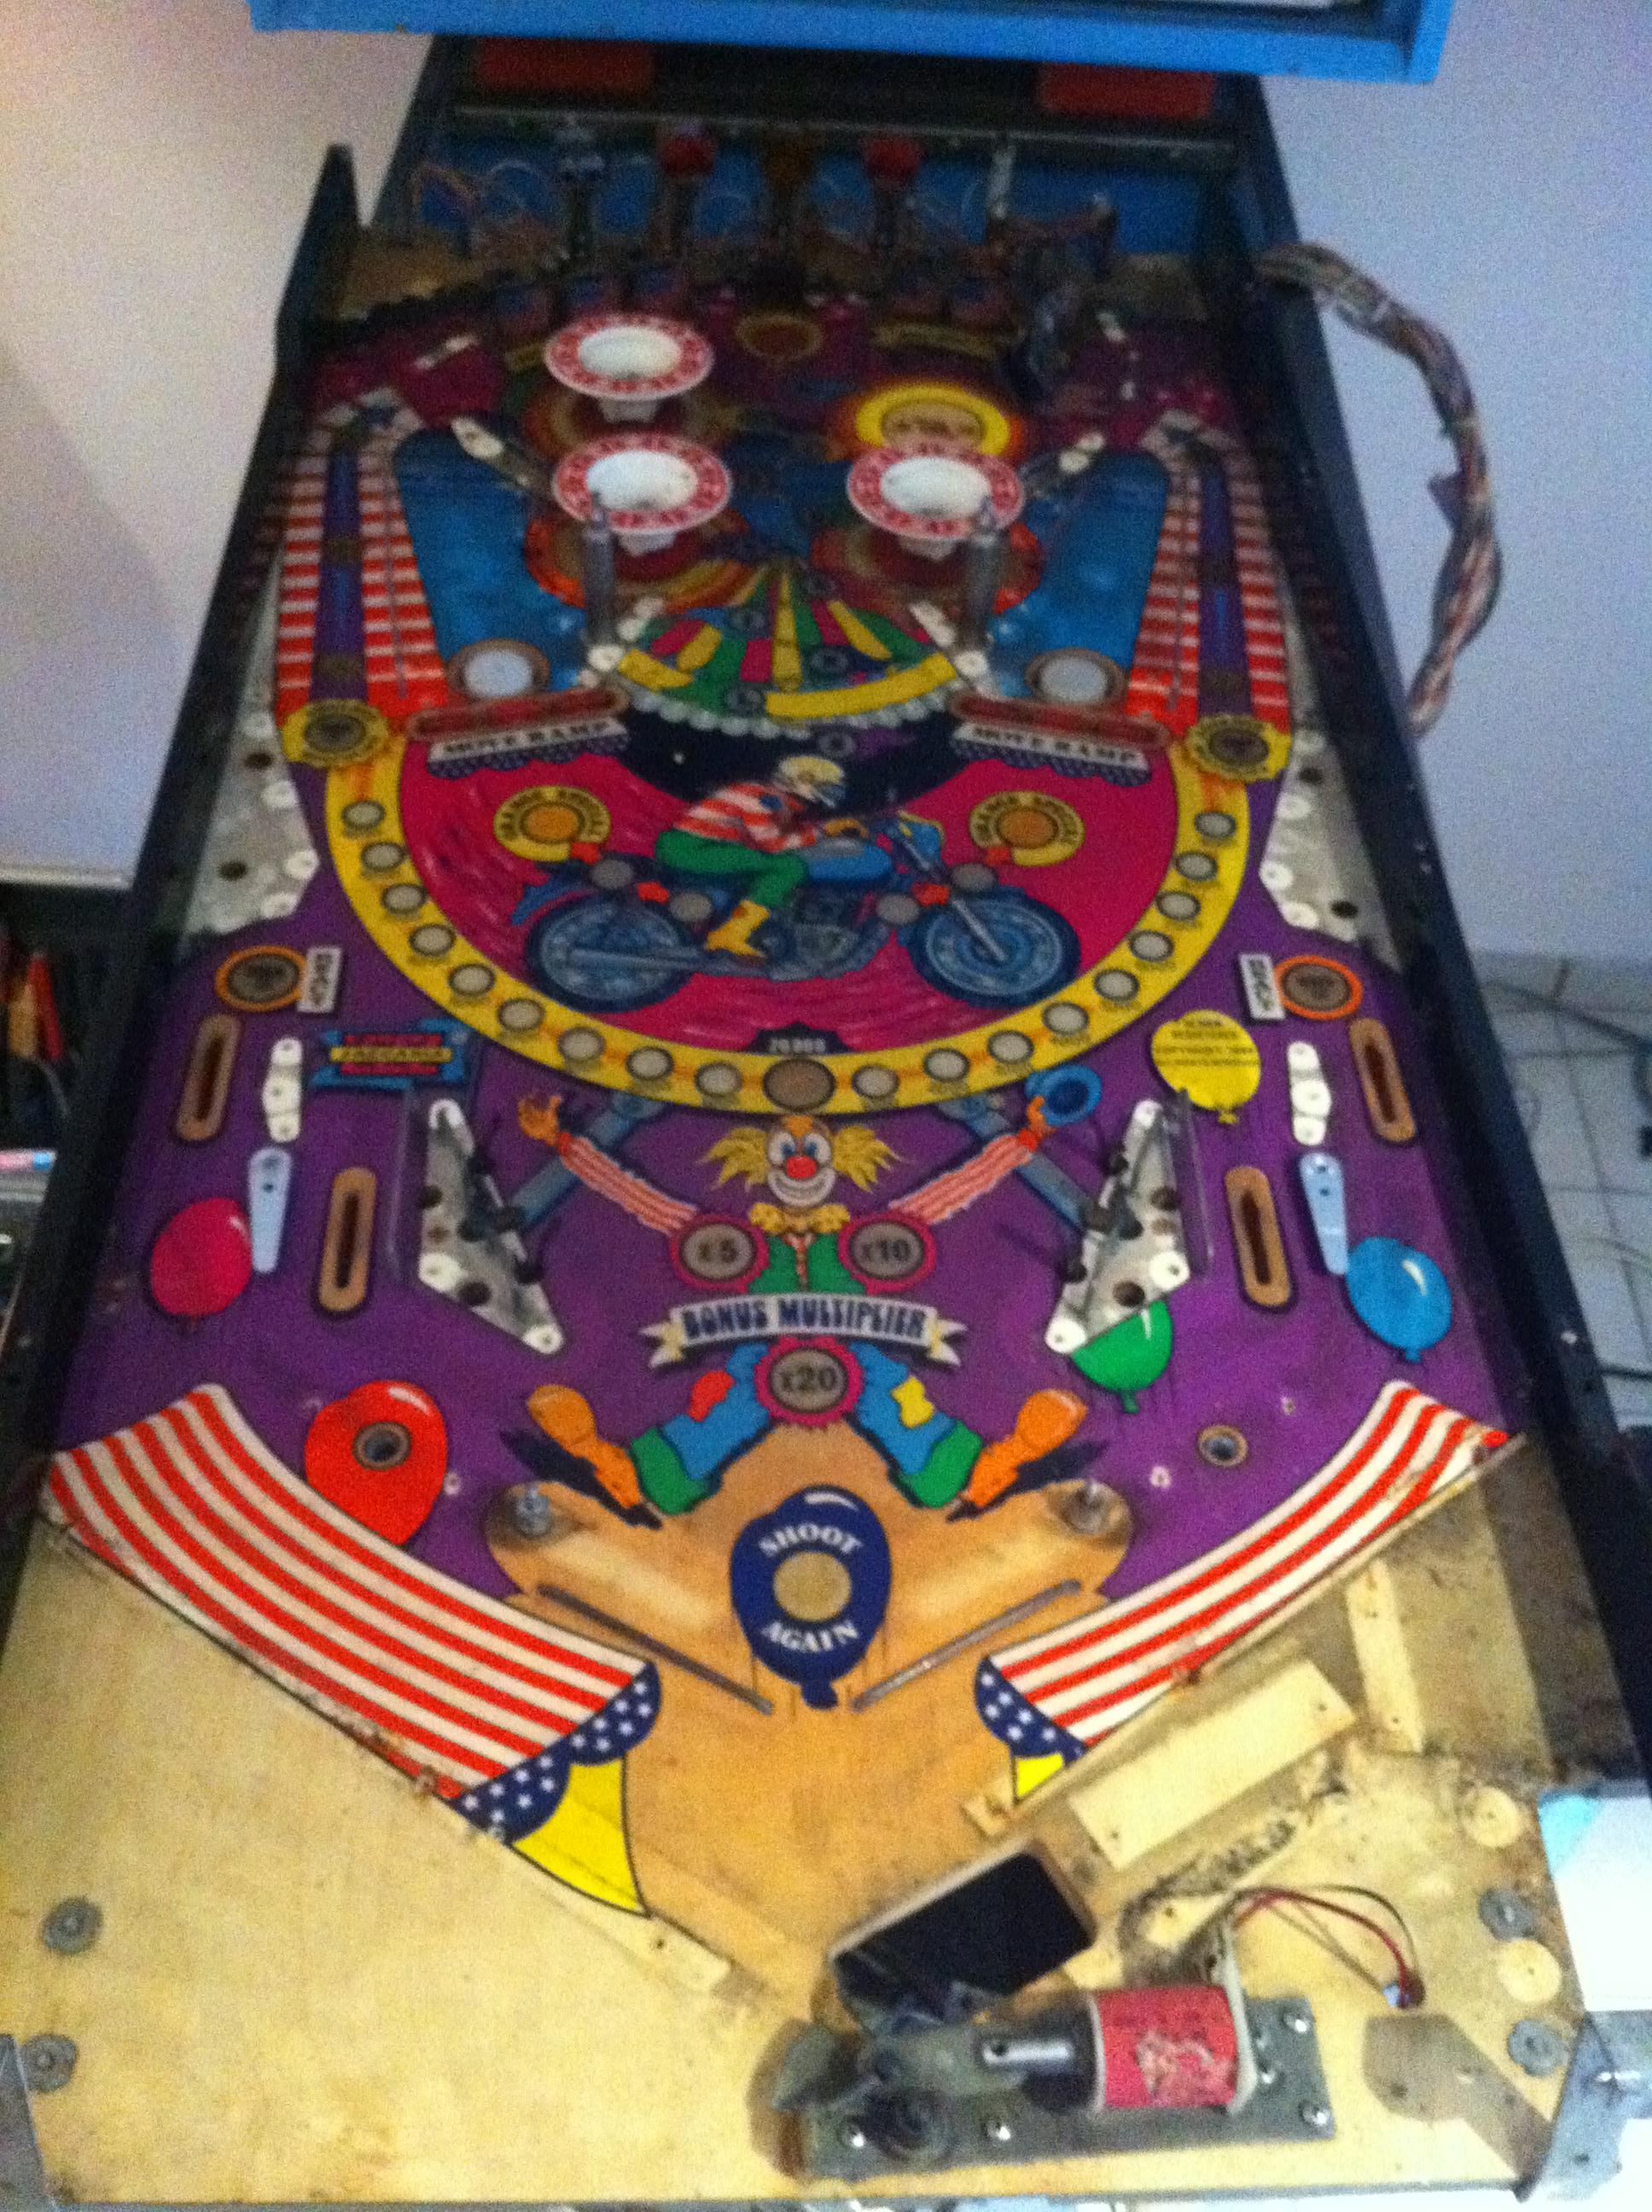 1984 Zaccaria Devil Riders Pinball Machine Rubber Ring Kit